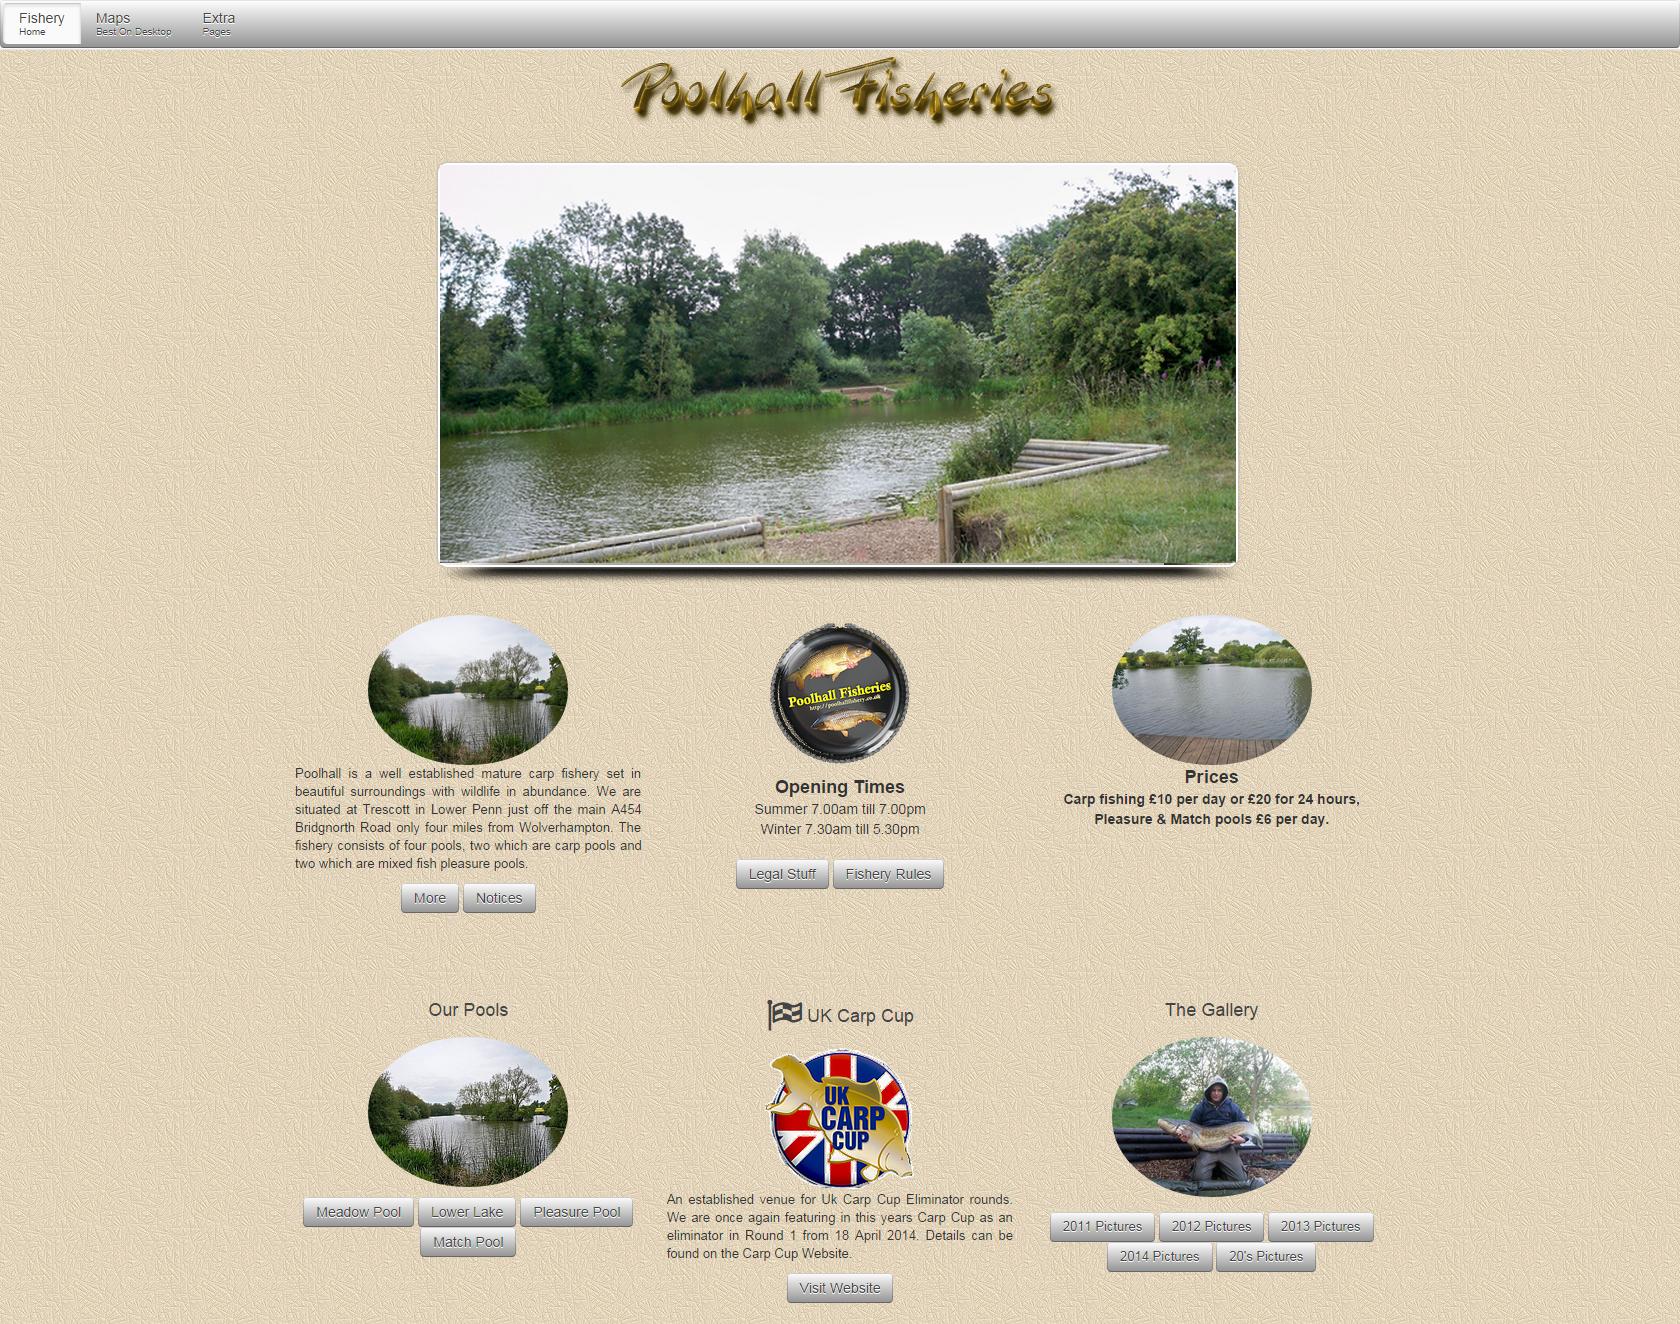 Poolhall Fisheries - http://carpfish.co.uk/listings/poolhall-fisheries/